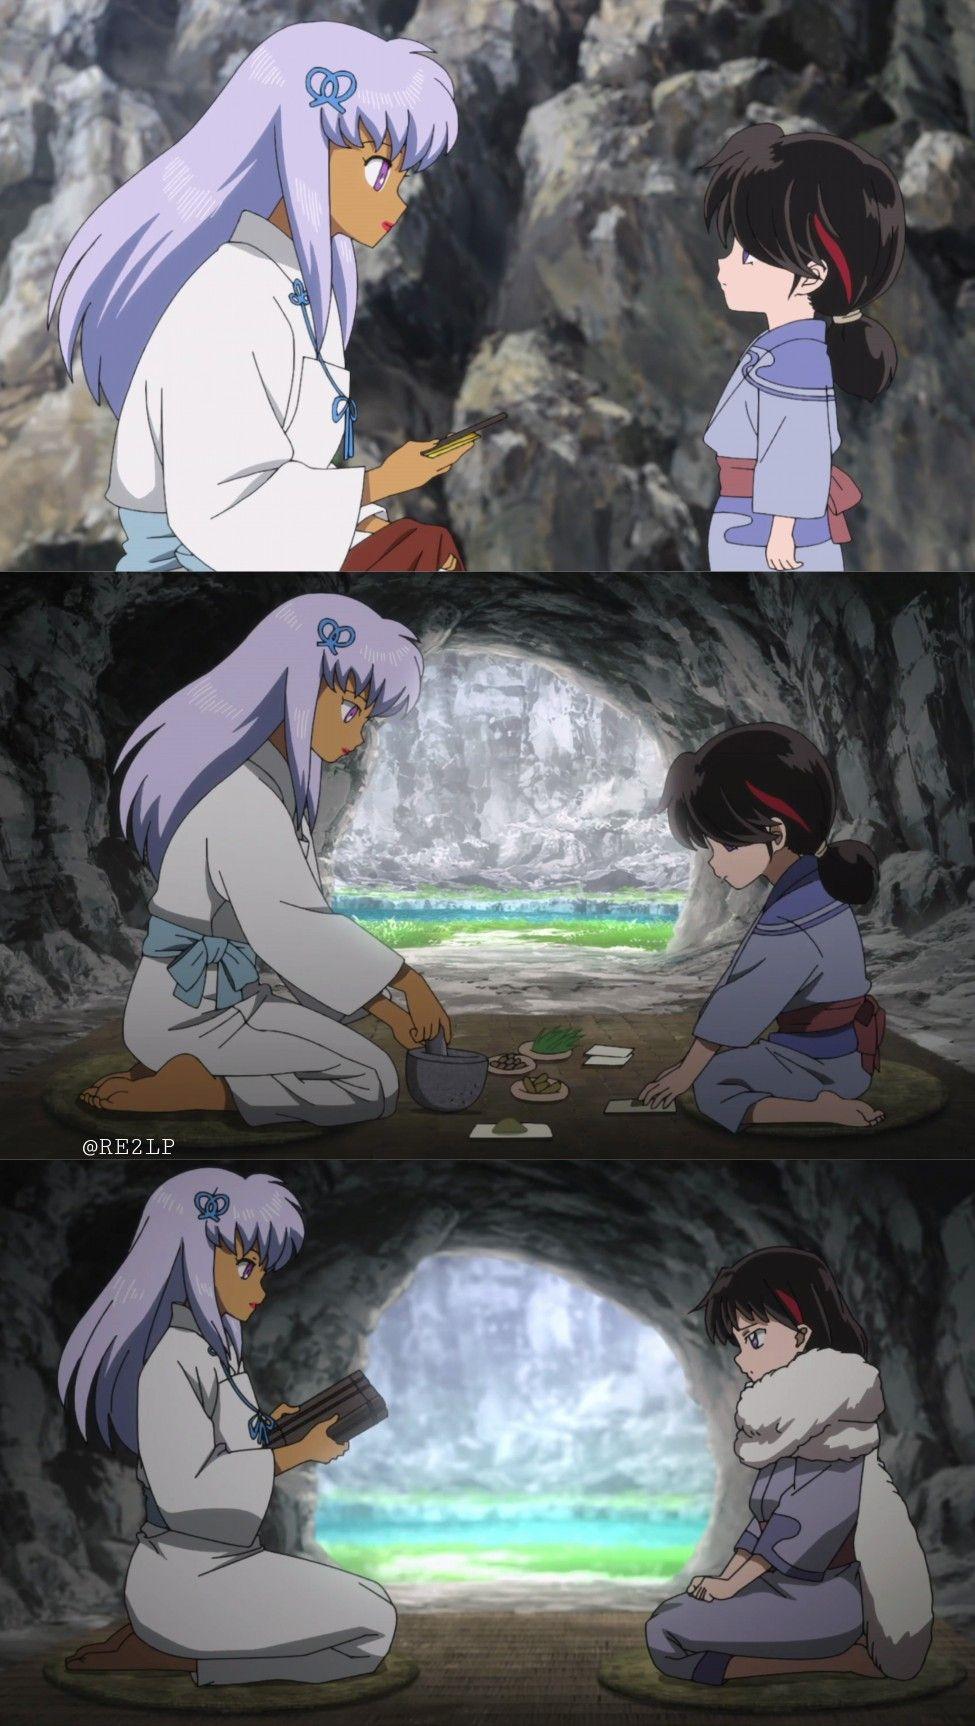 pin by re2lp on hanyou no yashahime sengoku otogizoushi in 2021 anime anime crossover kingdom hearts anime